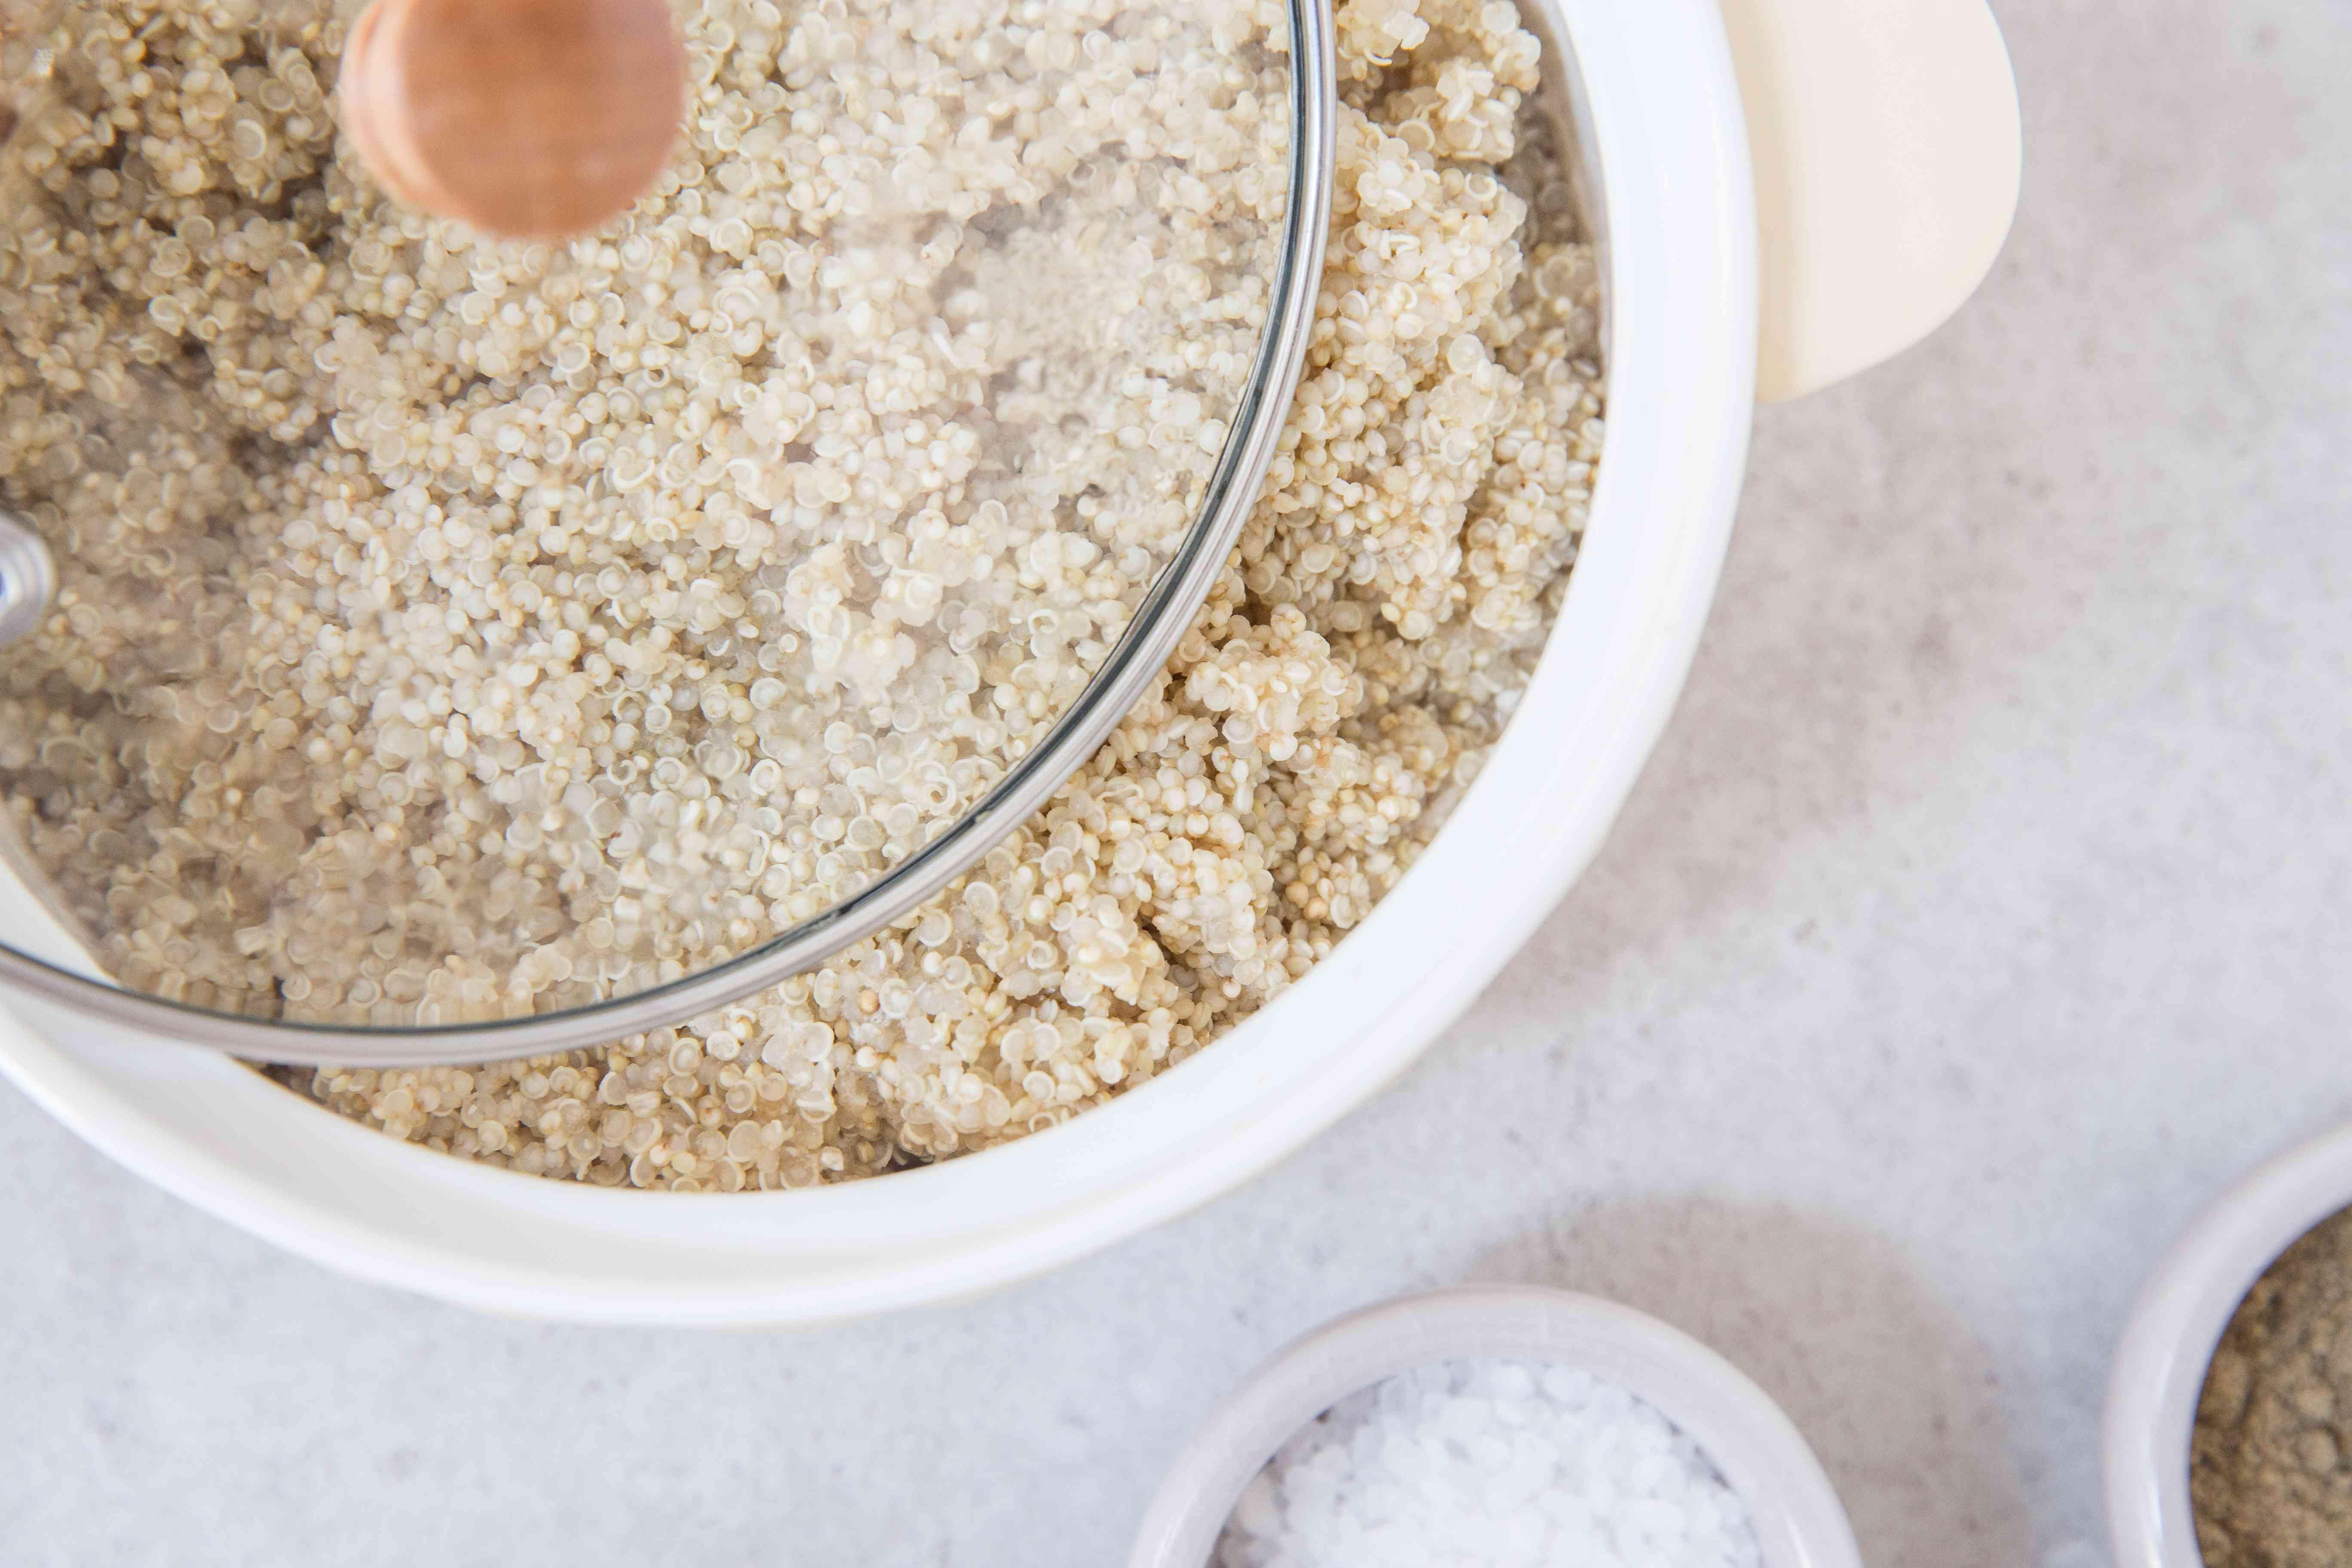 Simmer quinoa in vegetable broth